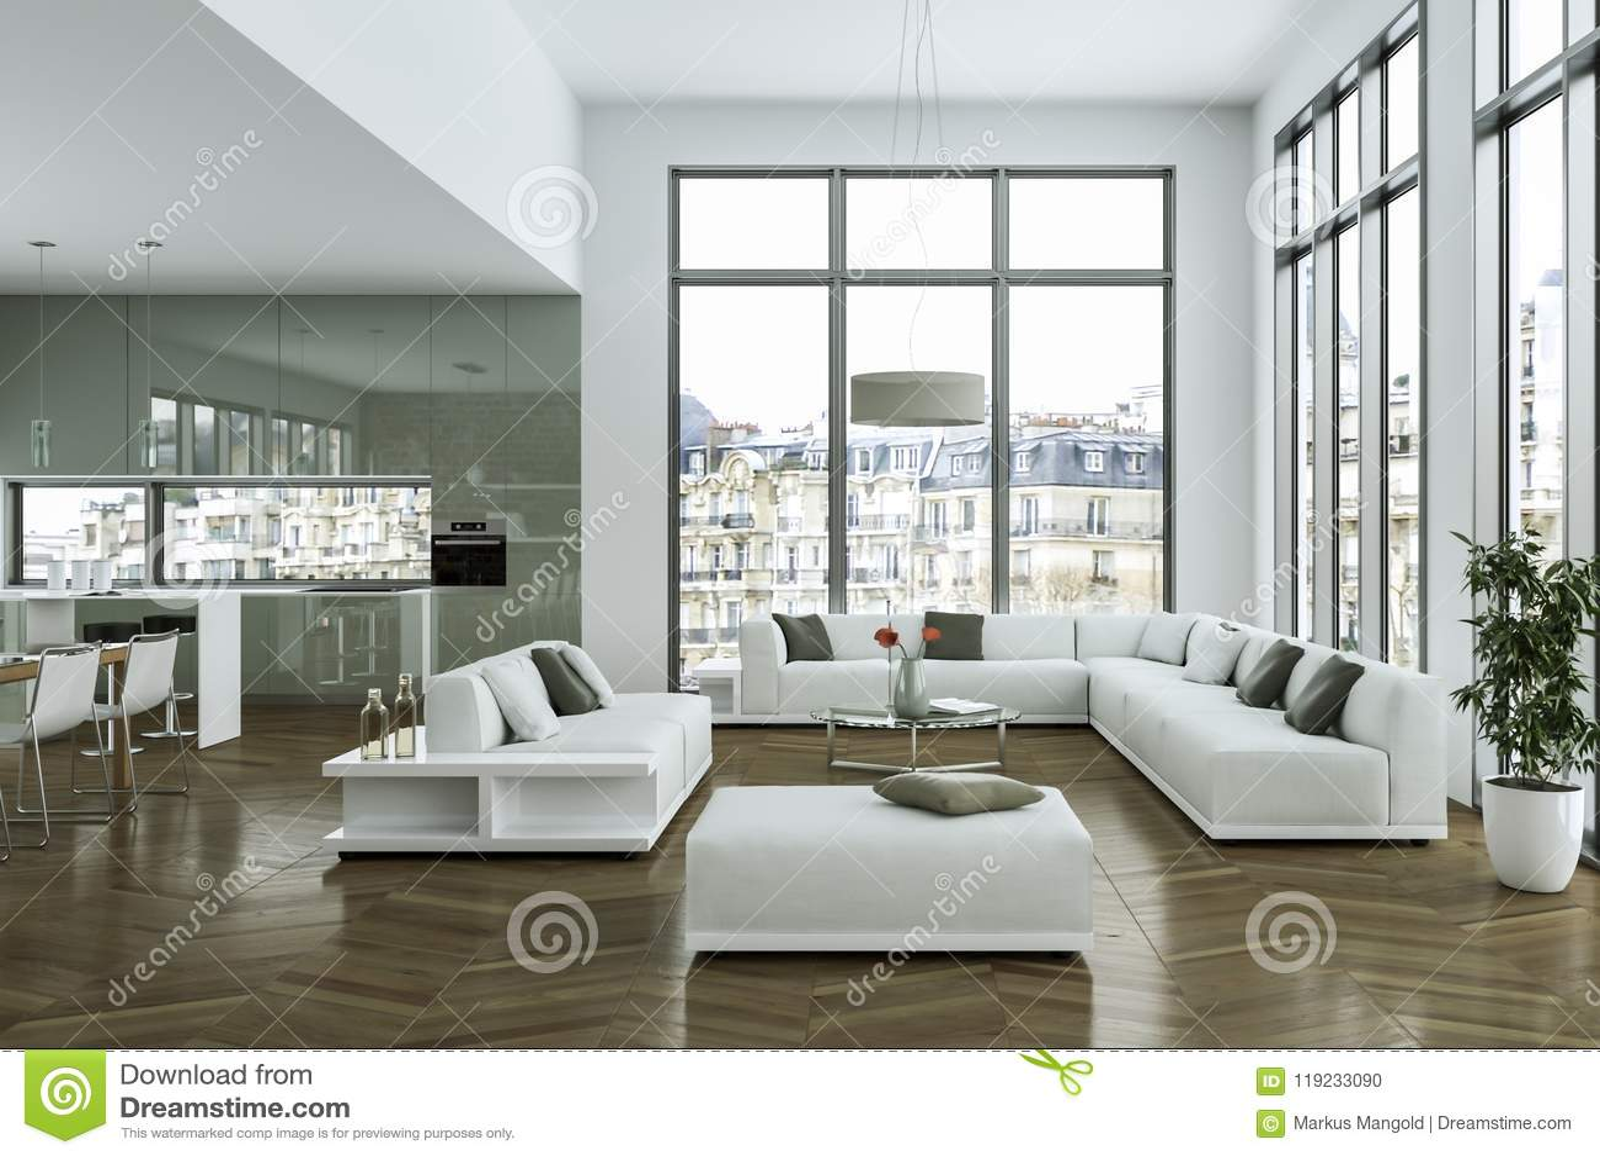 Modern Bright Loft With Big Windows Interior Design 3d Illustration